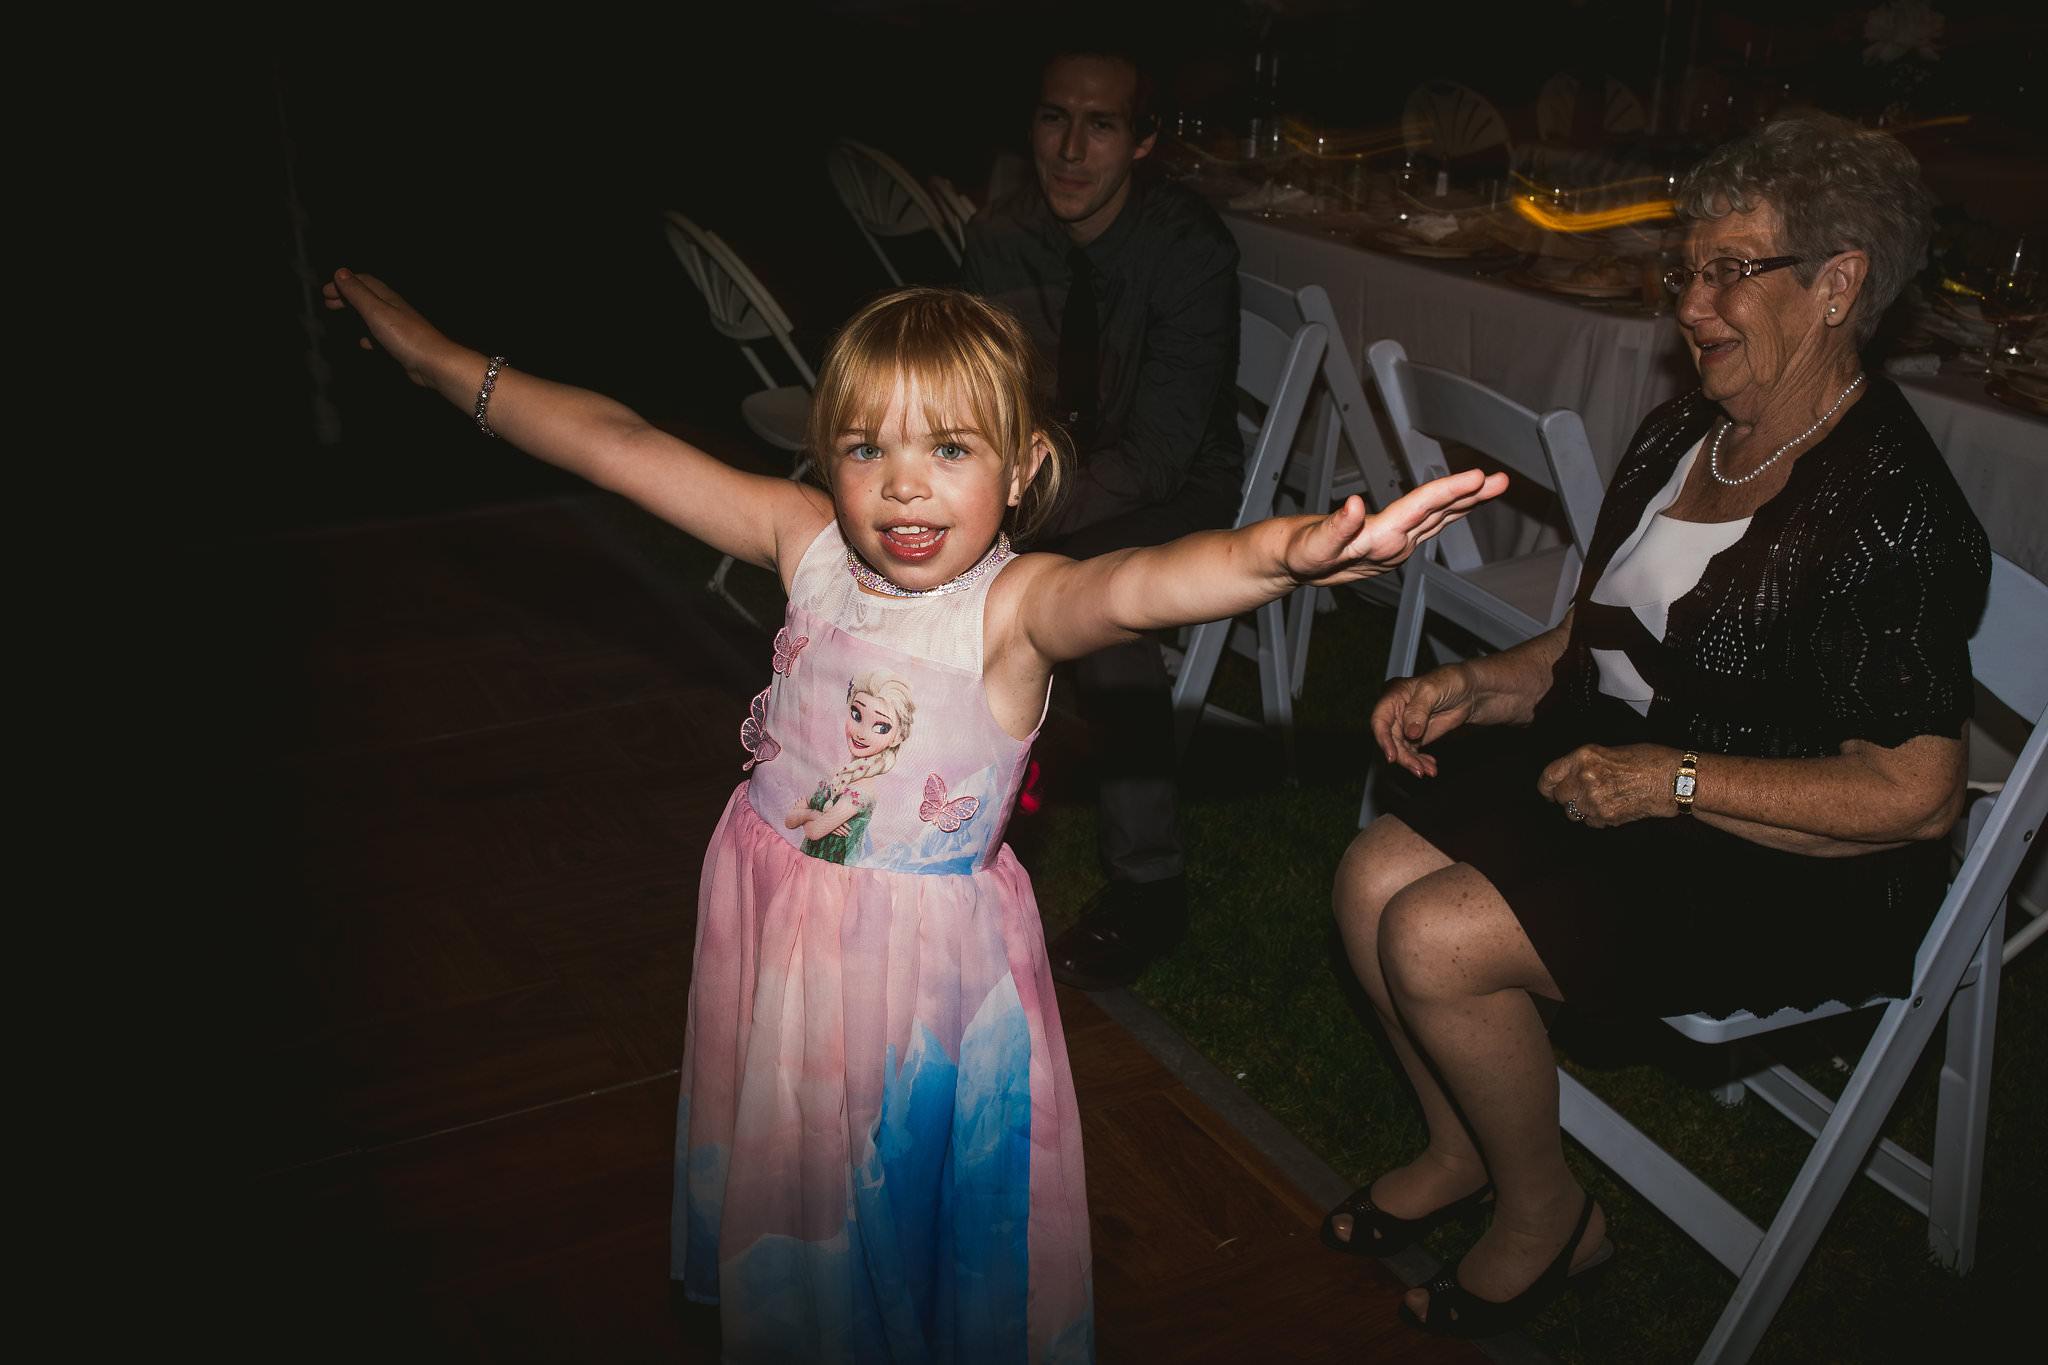 Kristen Adam Kindred Loft Whitby Wedding Photos 603 - Durham Wedding Photographer: Kindred Loft Wedding Photos